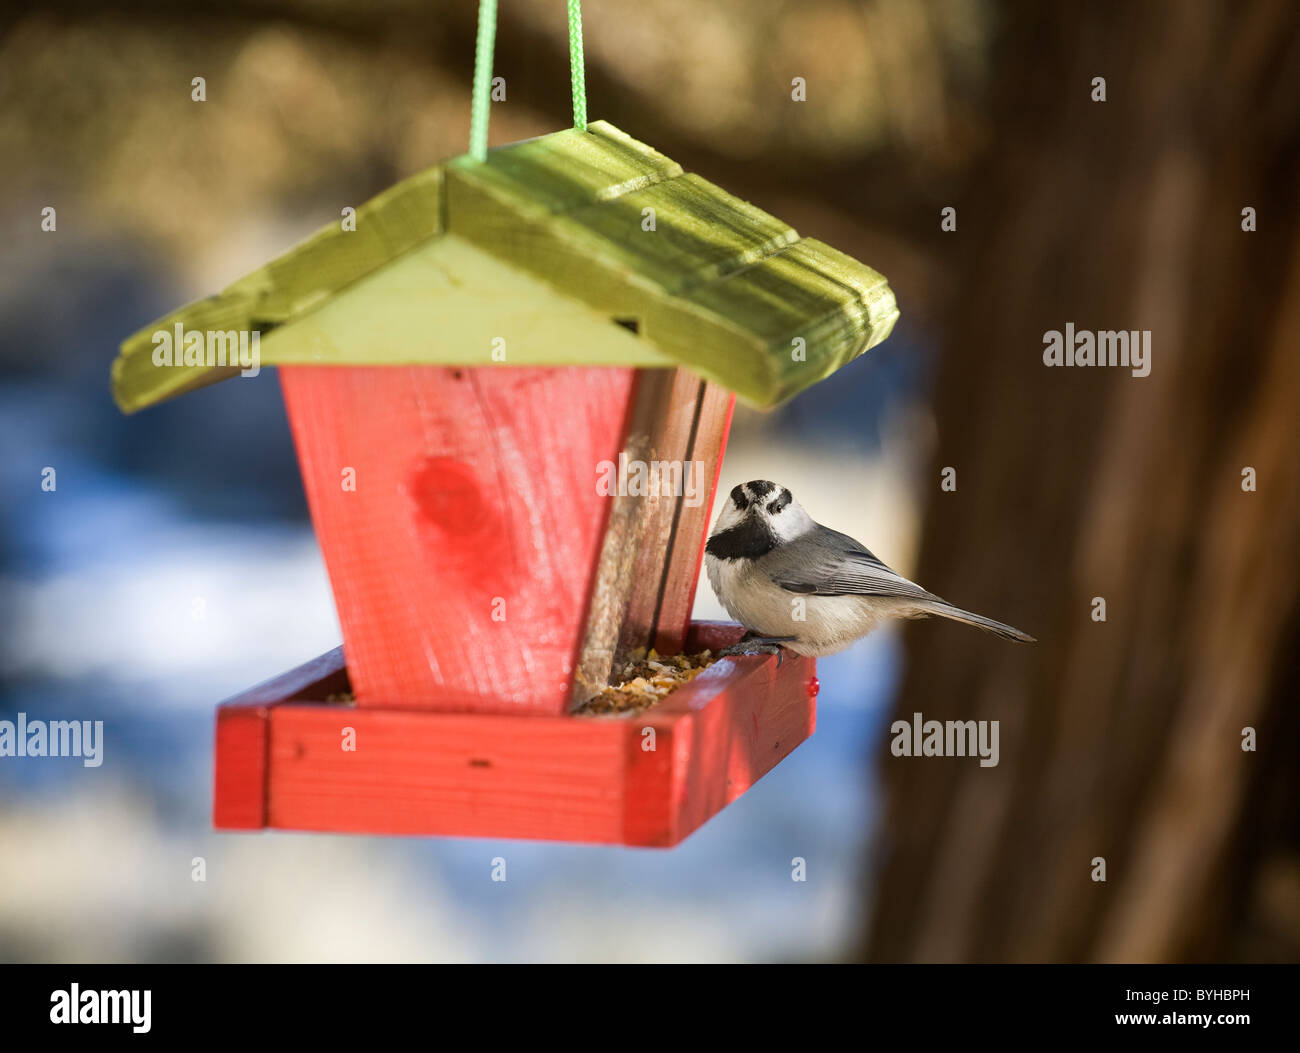 Mountain chickadee, Parus gambeli, on a bird feeder - Stock Image